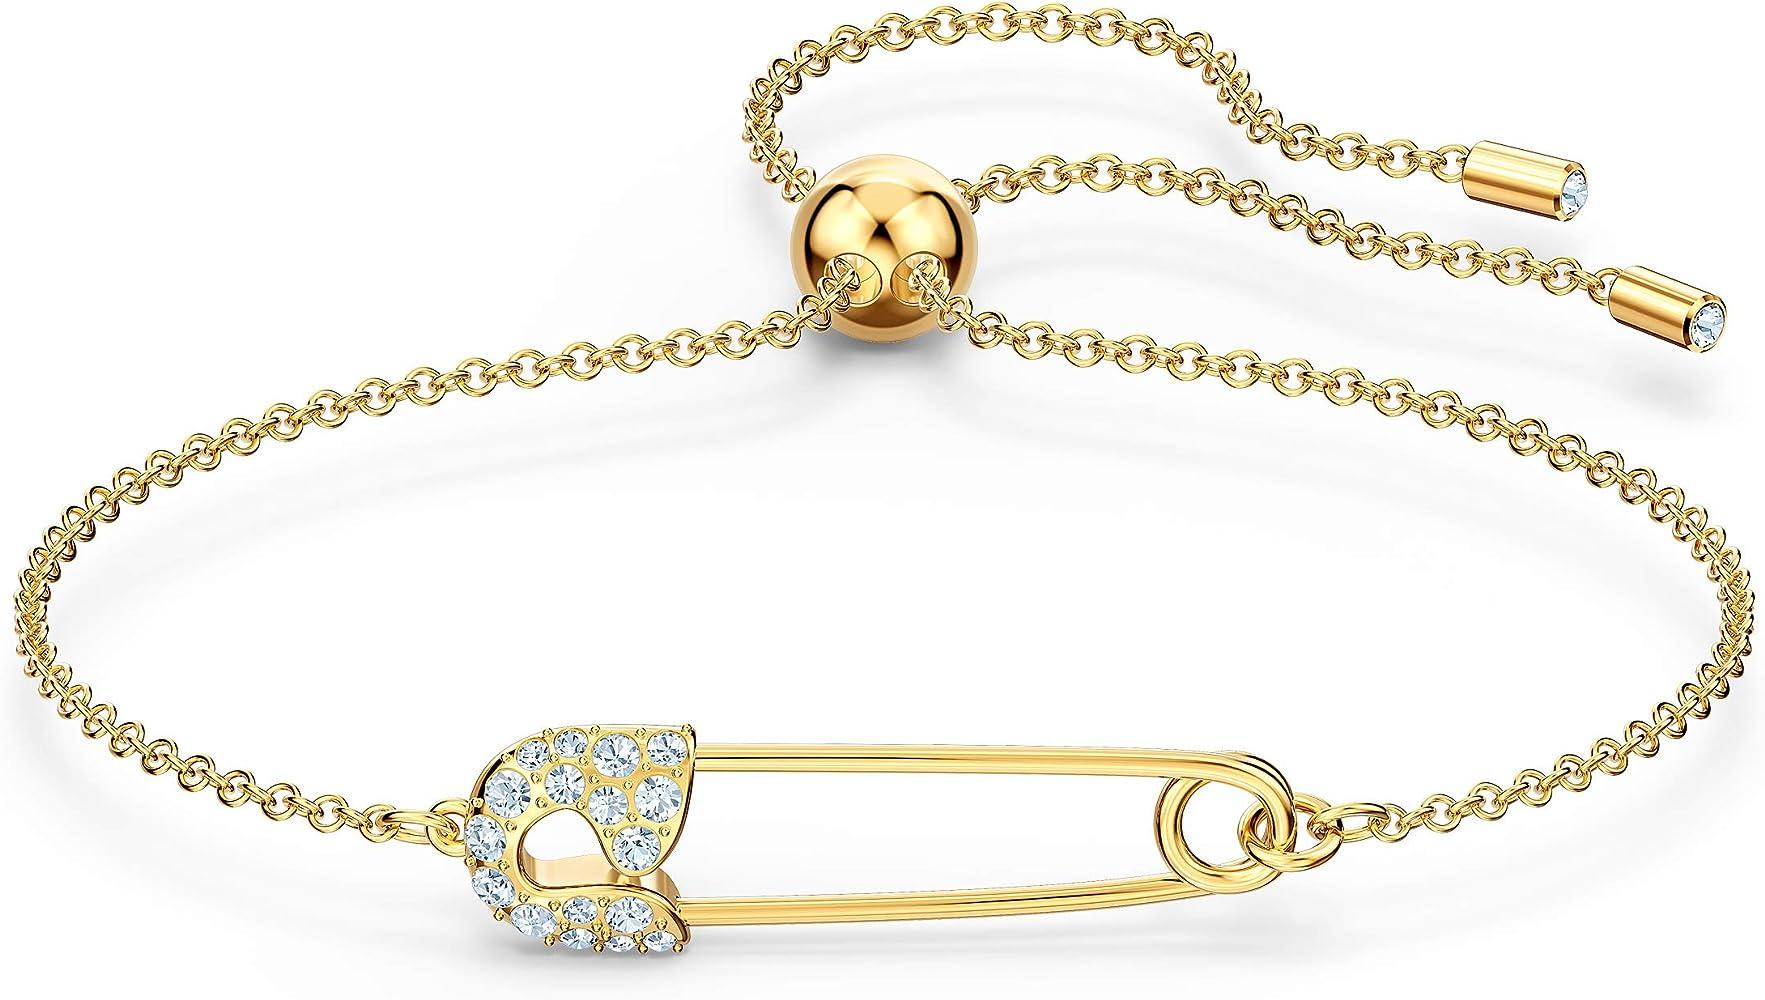 Swarovski So Cool Pin Armband, Weiß, vergoldet: